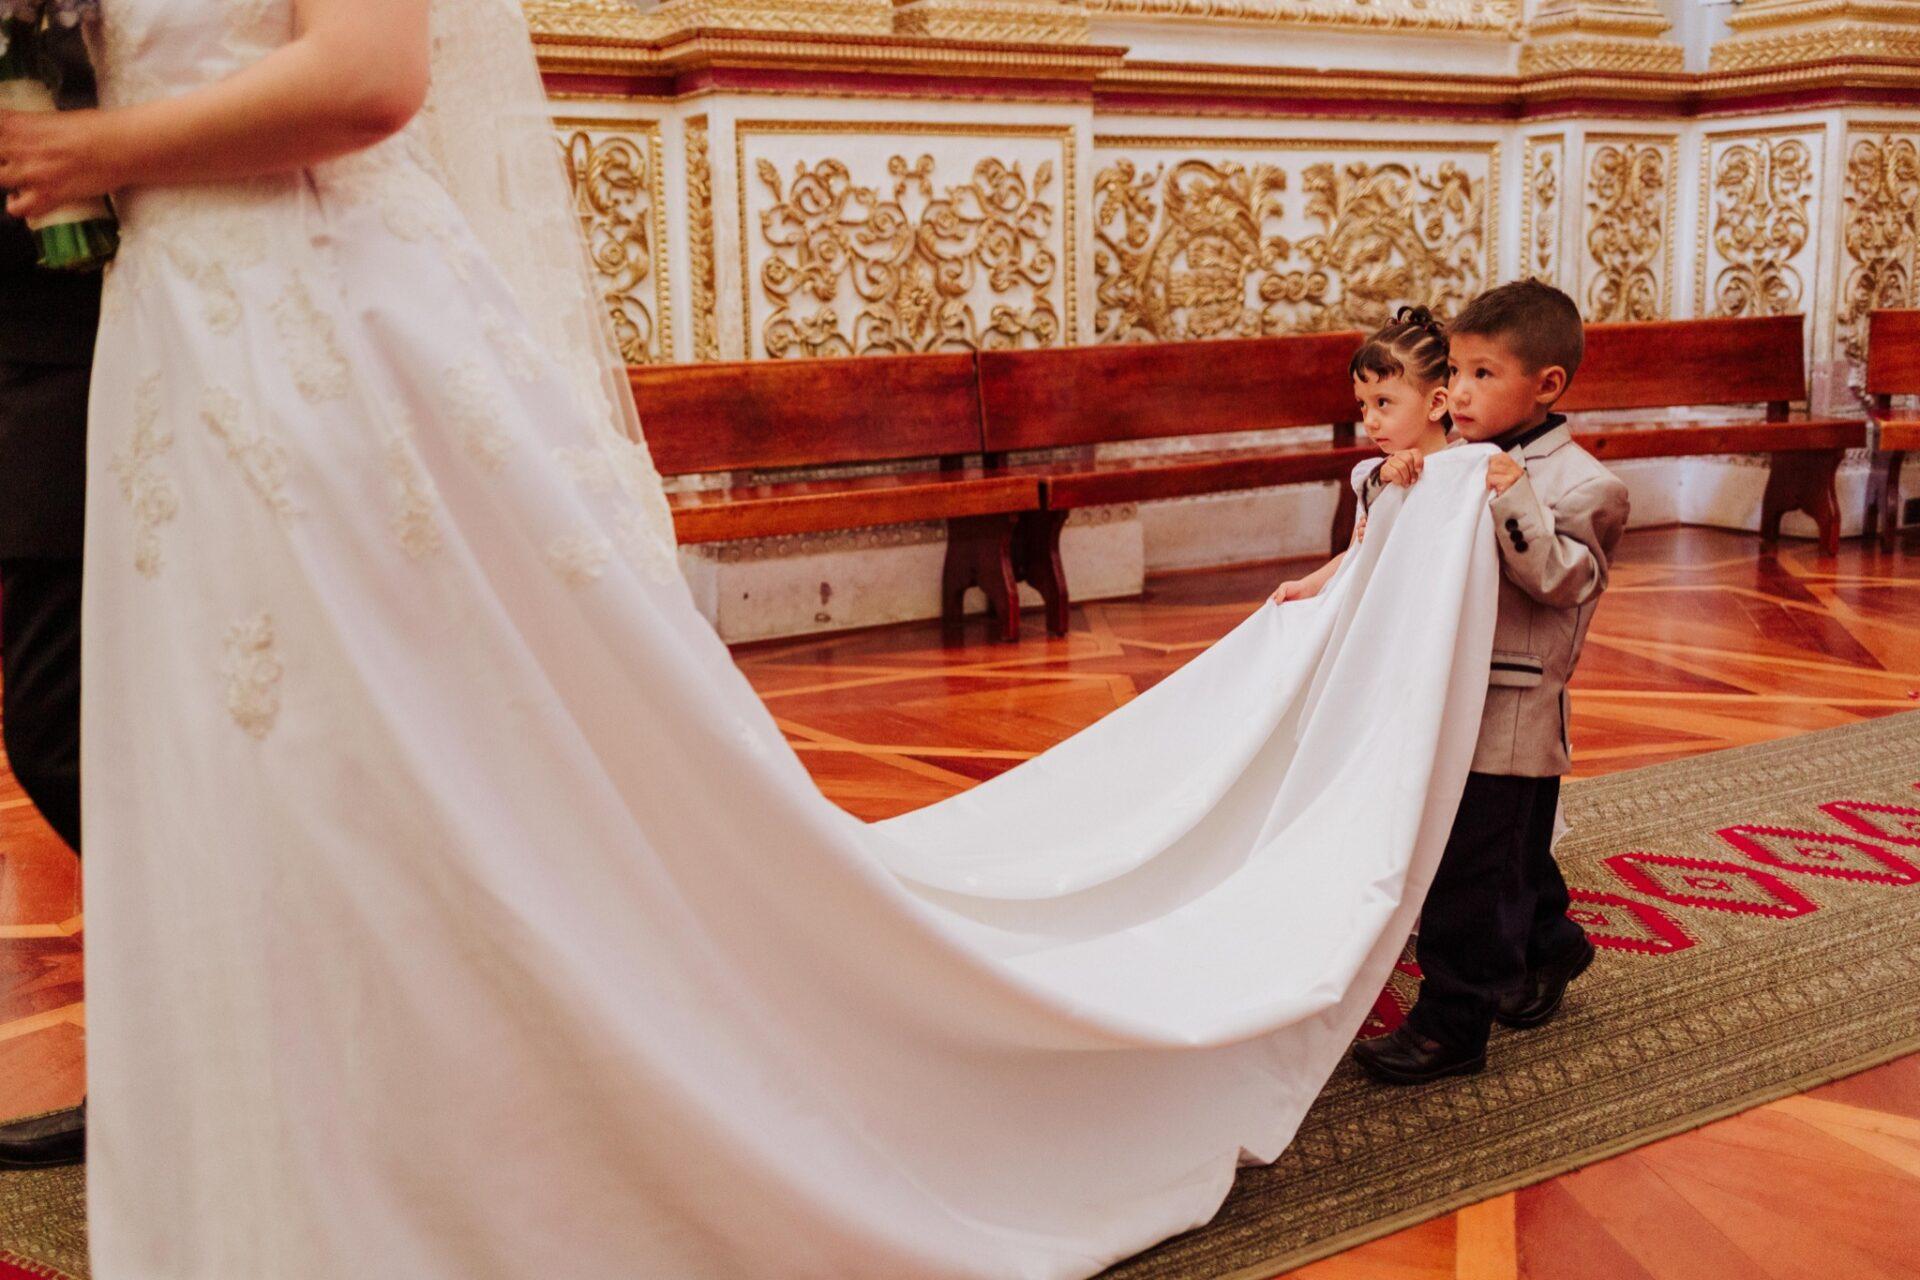 javier_noriega_fotografo_bodas_centro_platero_zacatecas_wedding_photographer6